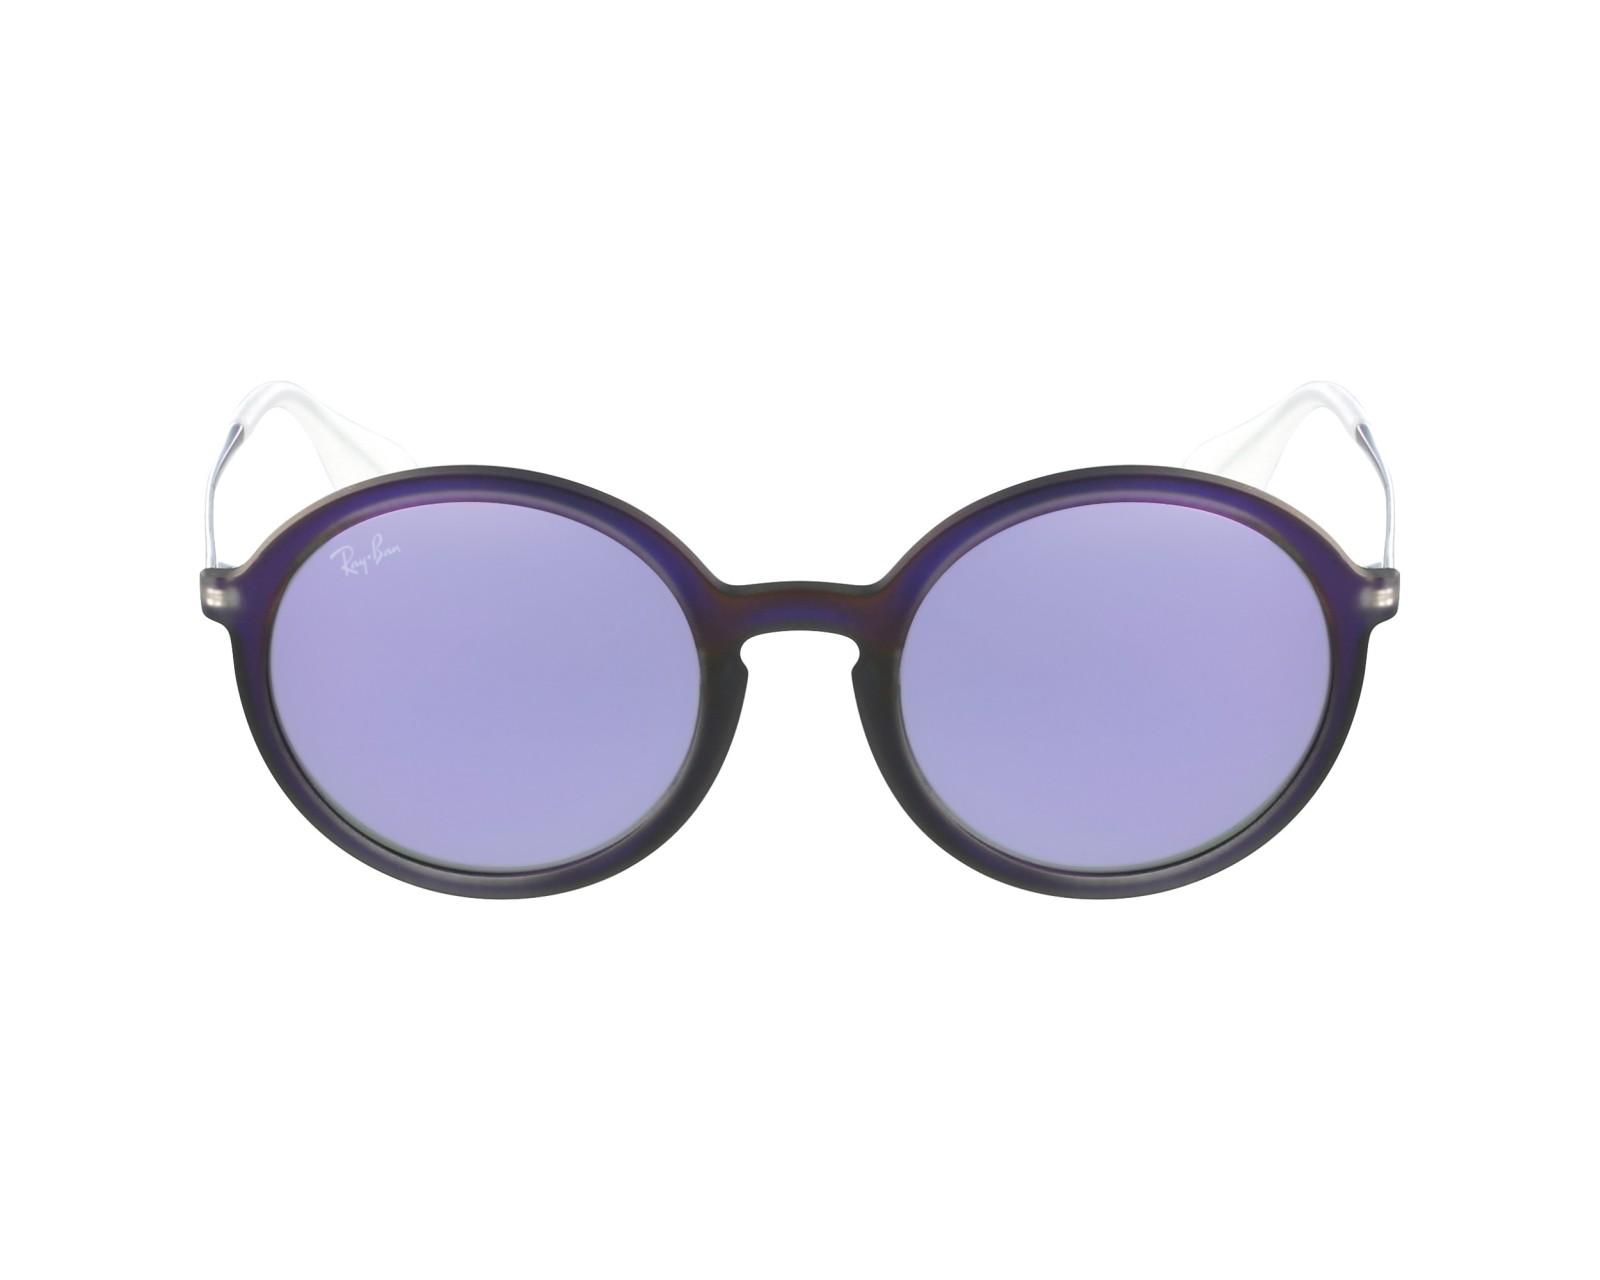 44127c71a0 thumbnail Sunglasses Ray-Ban RB-4222 6168 4V - Purple Gun profile view